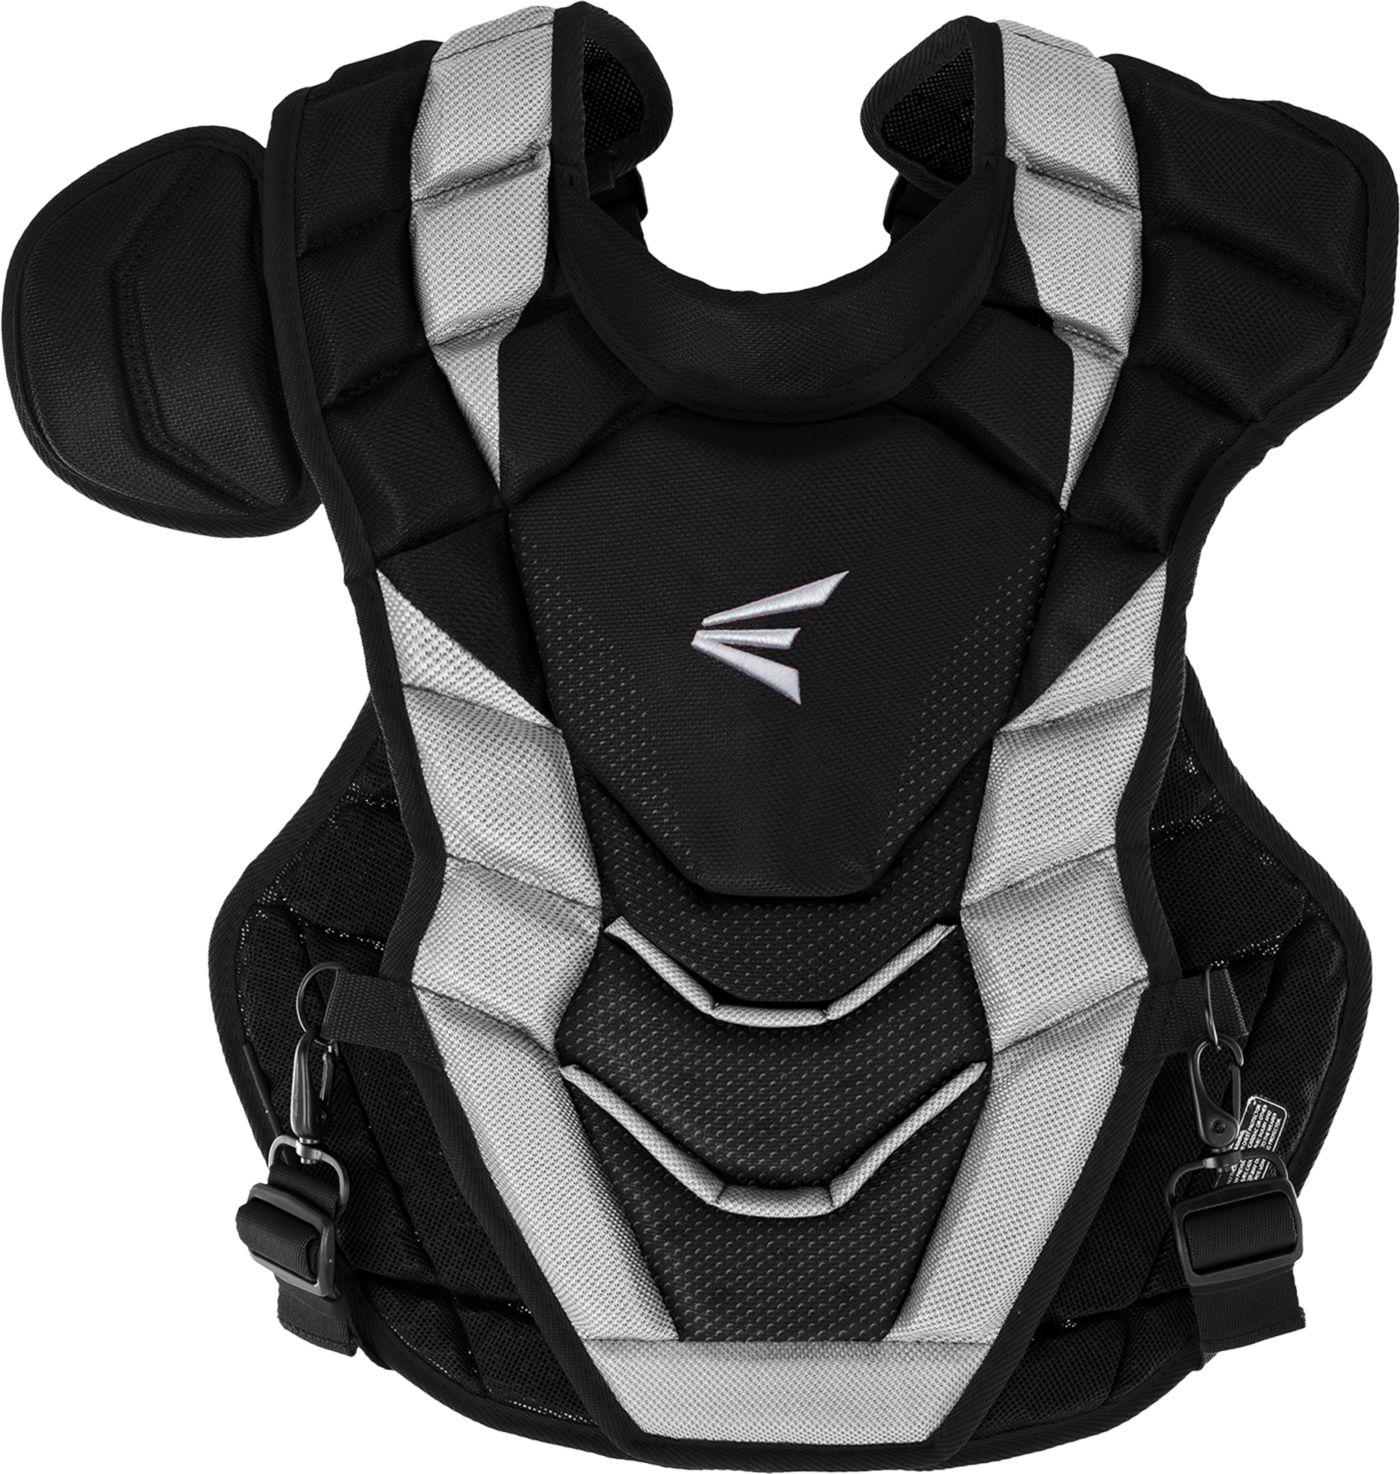 Easton Intermediate Pro X Chest Protector 2019